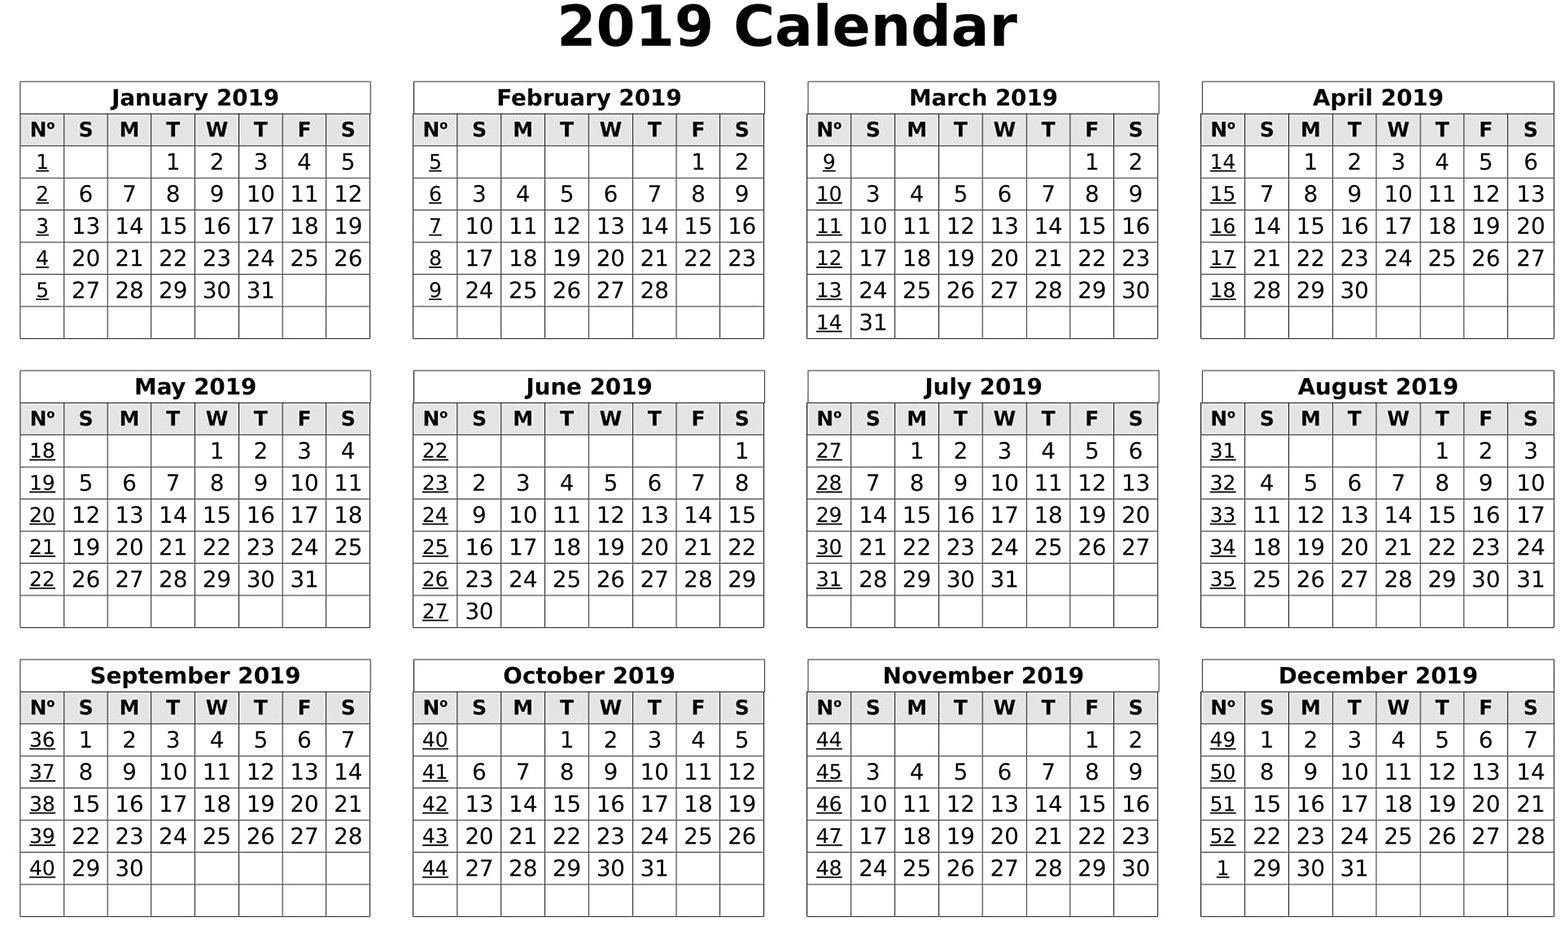 Calendar 2019 Print Out | Free Printable 2018 Calendar Template Word Calendar 2019 To Print